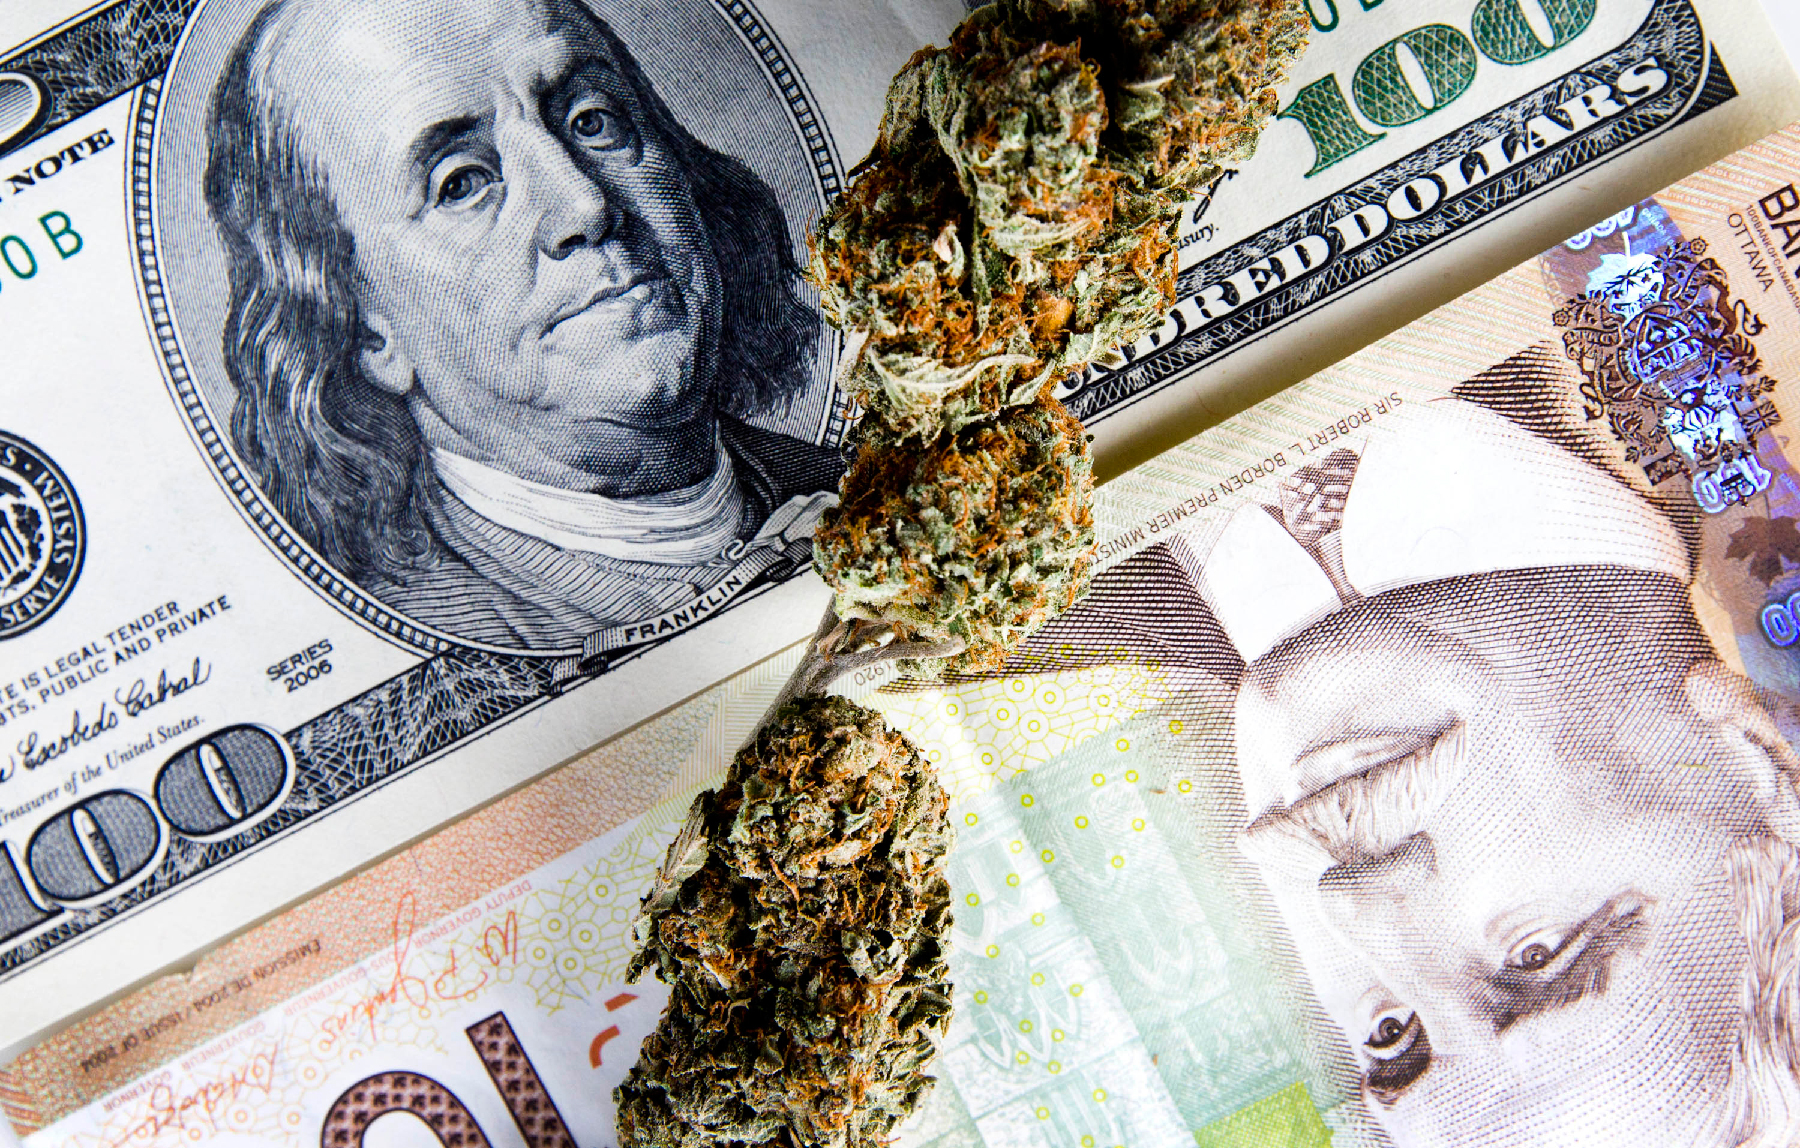 Colorado Marijuana Industry Gets New Banking System